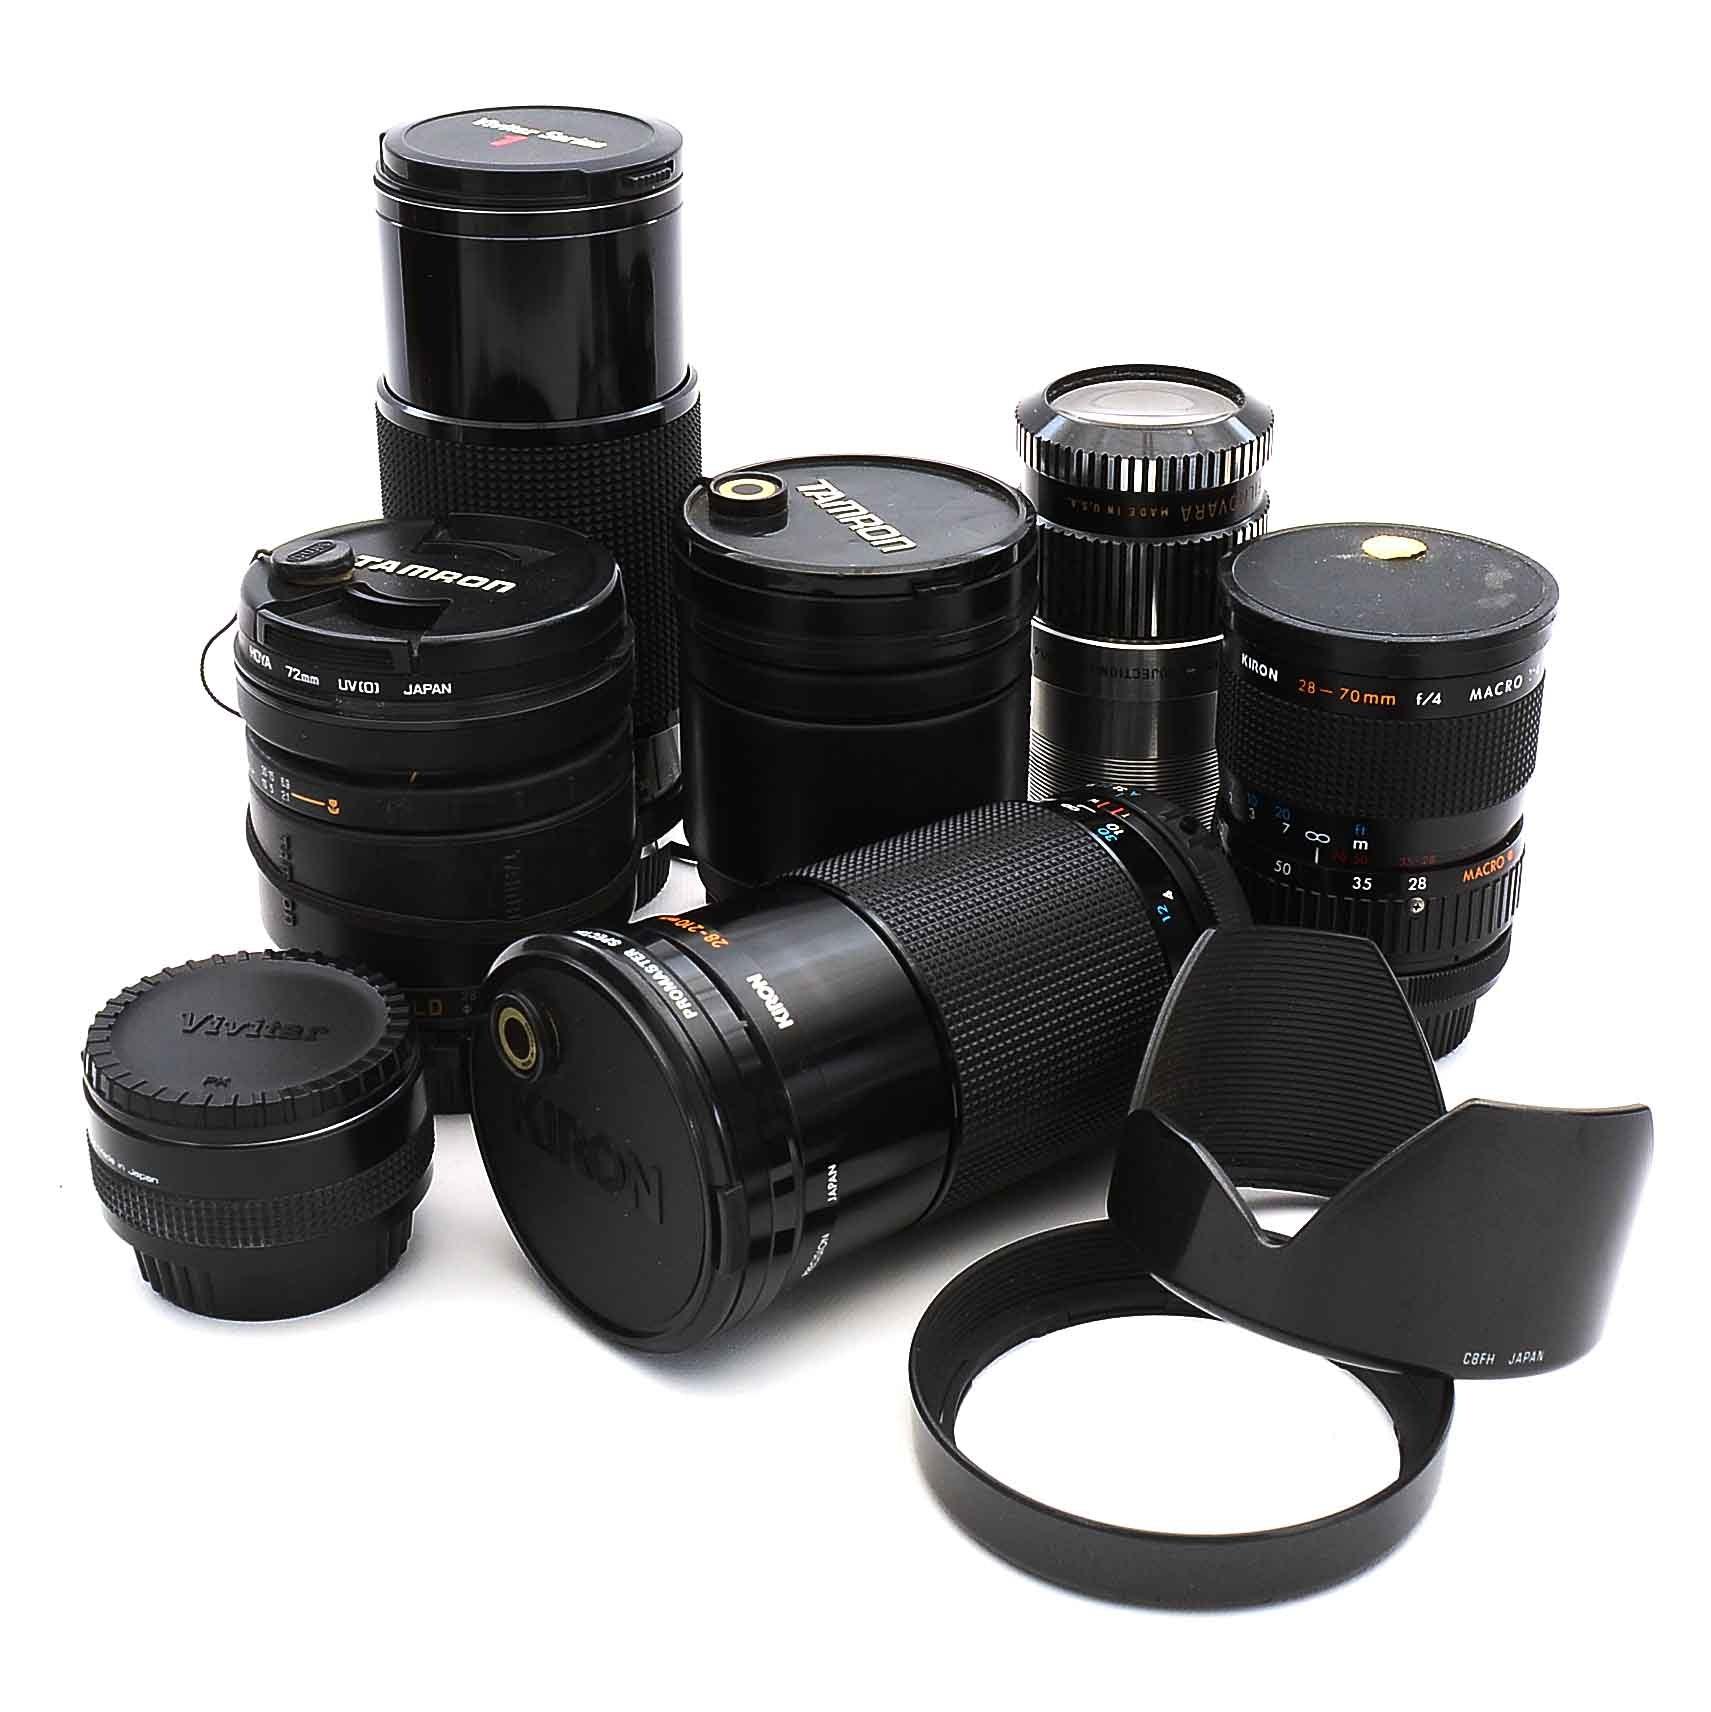 Camera Lenses Including Vivitar, Sigma, Kiron and More